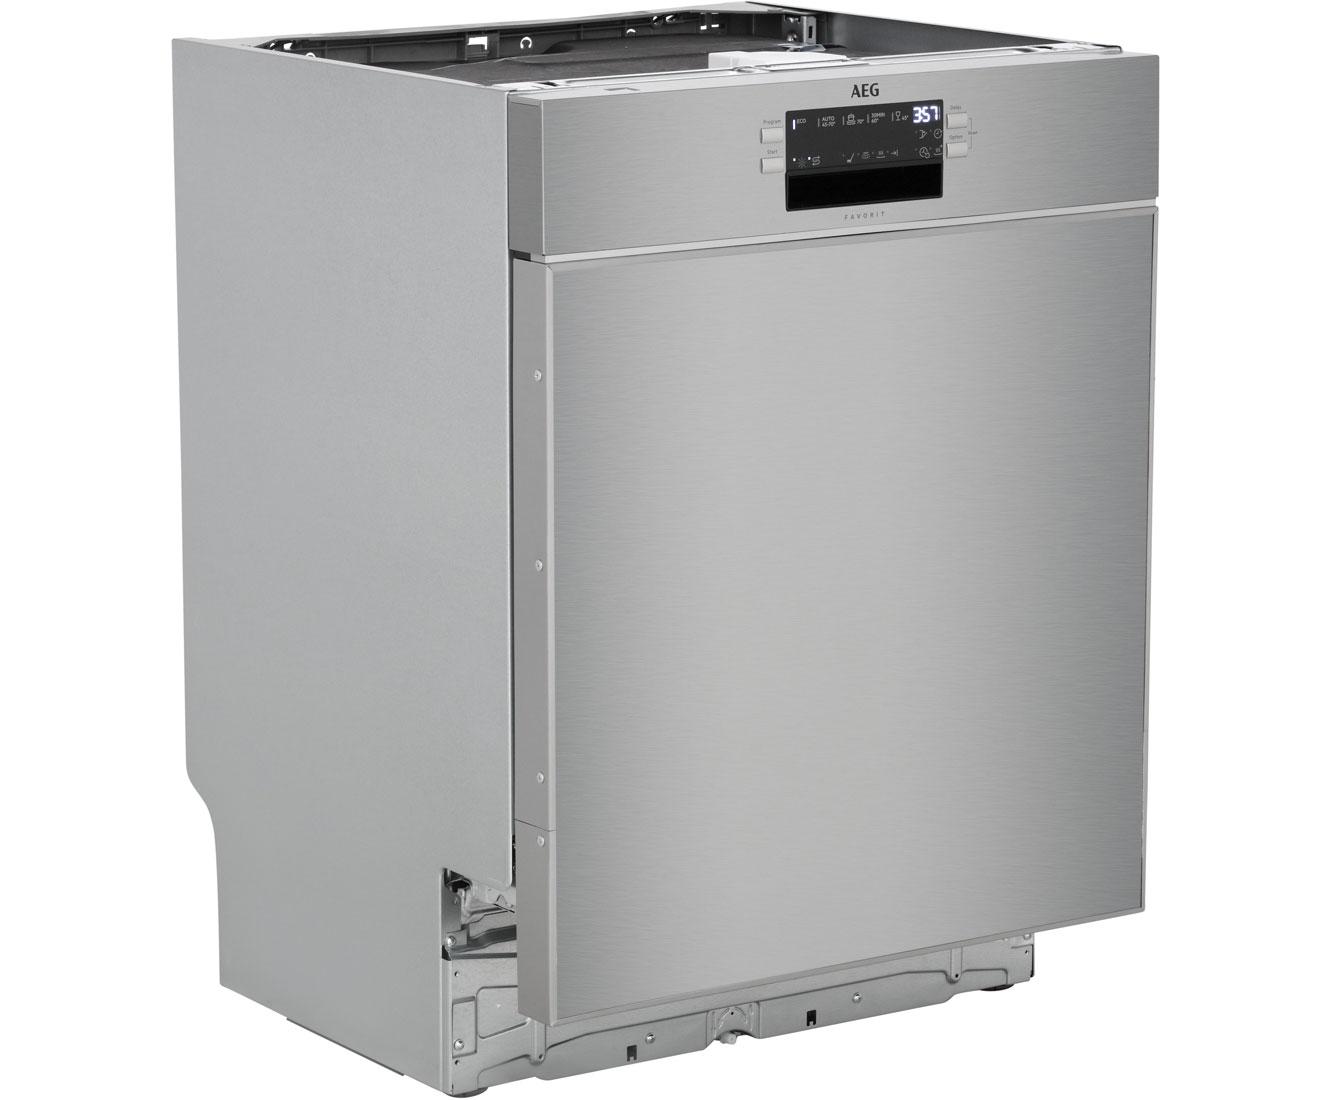 Aeg Kühlschrank Unterbau : Aeg fus azm geschirrspüler favorit unterbau cm edelstahl neu